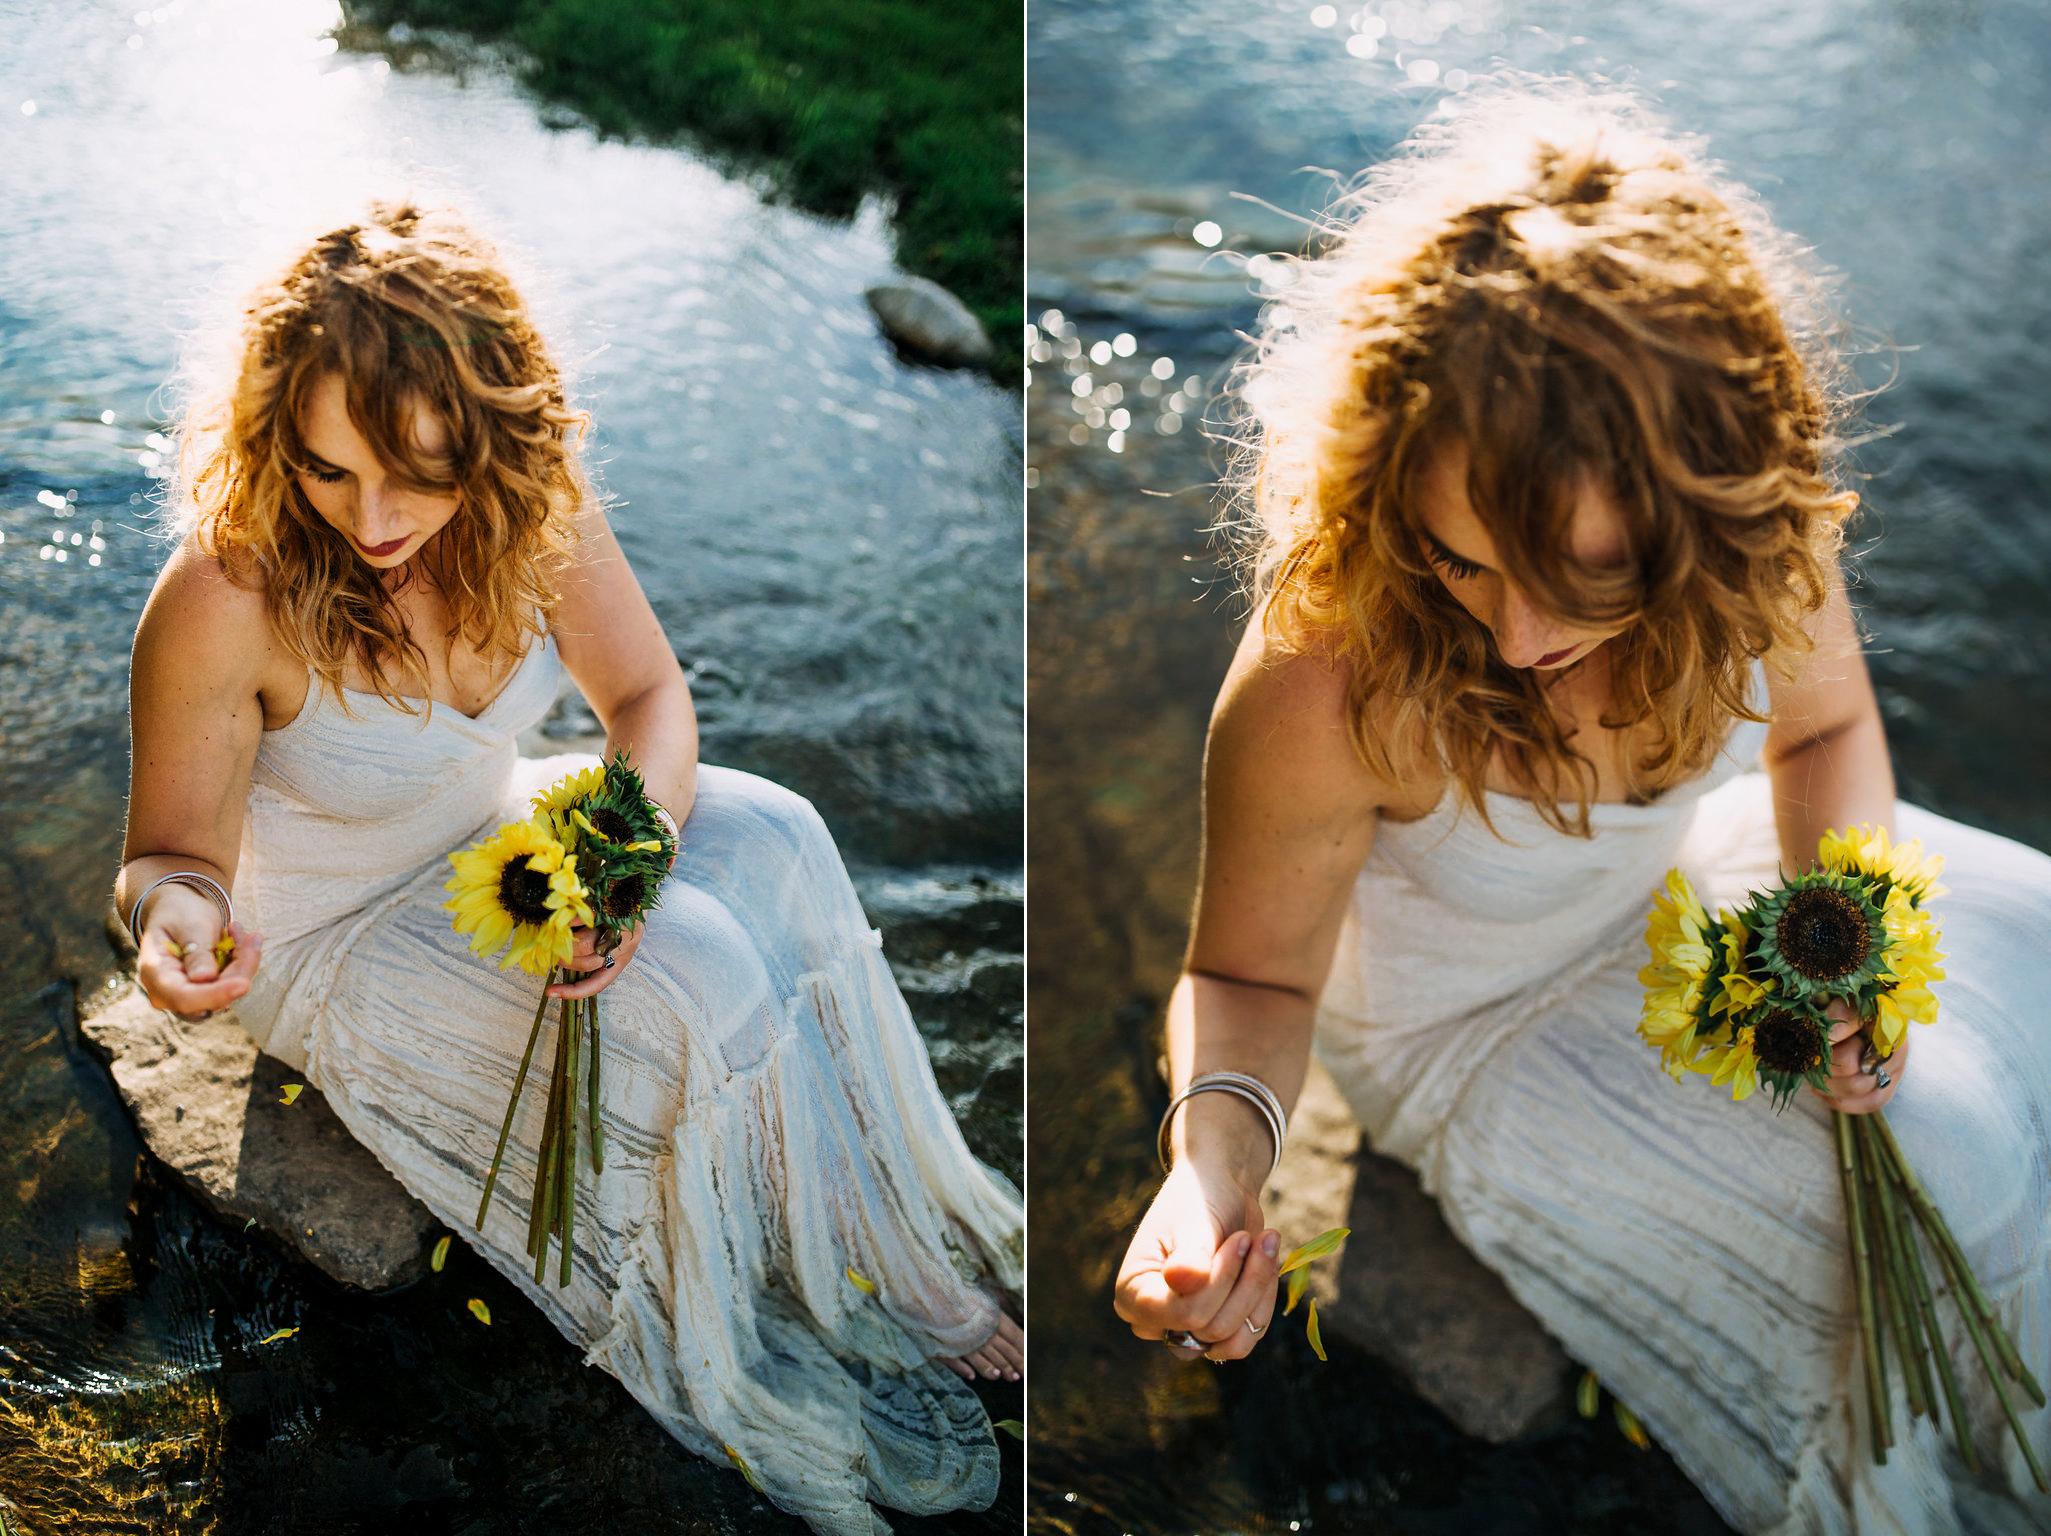 Camille-Joy-Music-Franklin-Tennessee-Photographer-Creek-Berry-Farms-Senior-Portraits-Water-18